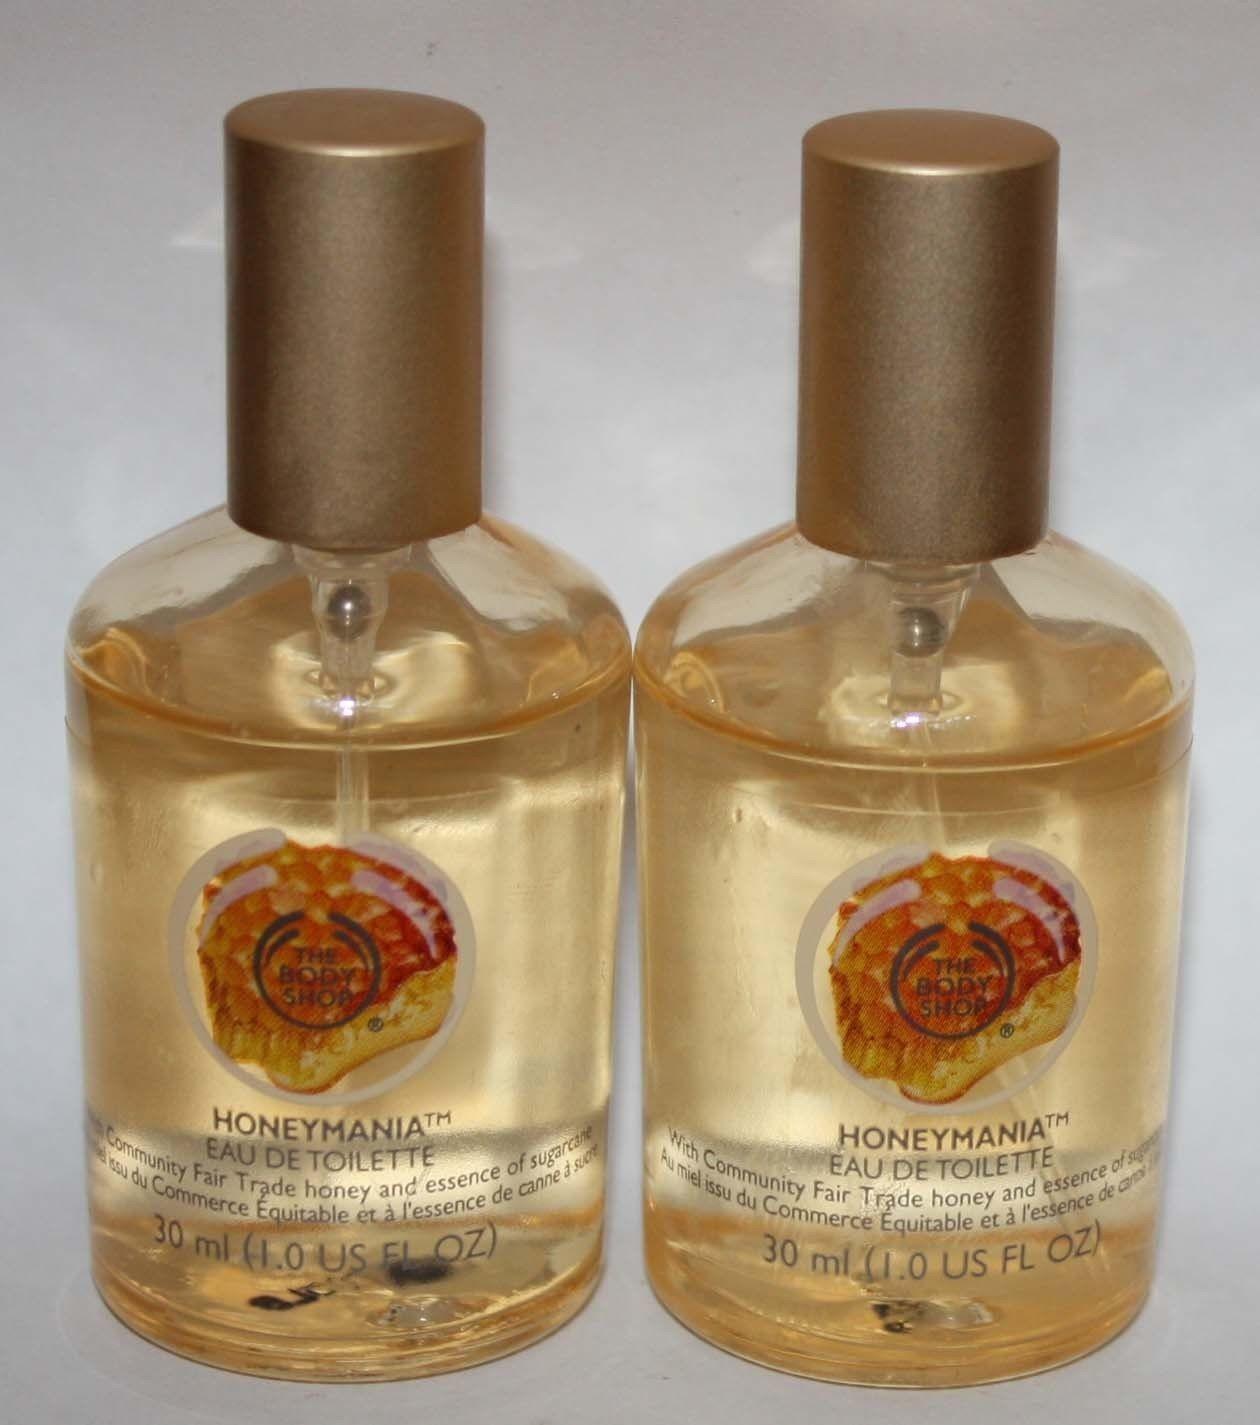 Lot of 2 The Body Shop Women's Honeymania Eau De Toilette Spray 1 oz Each